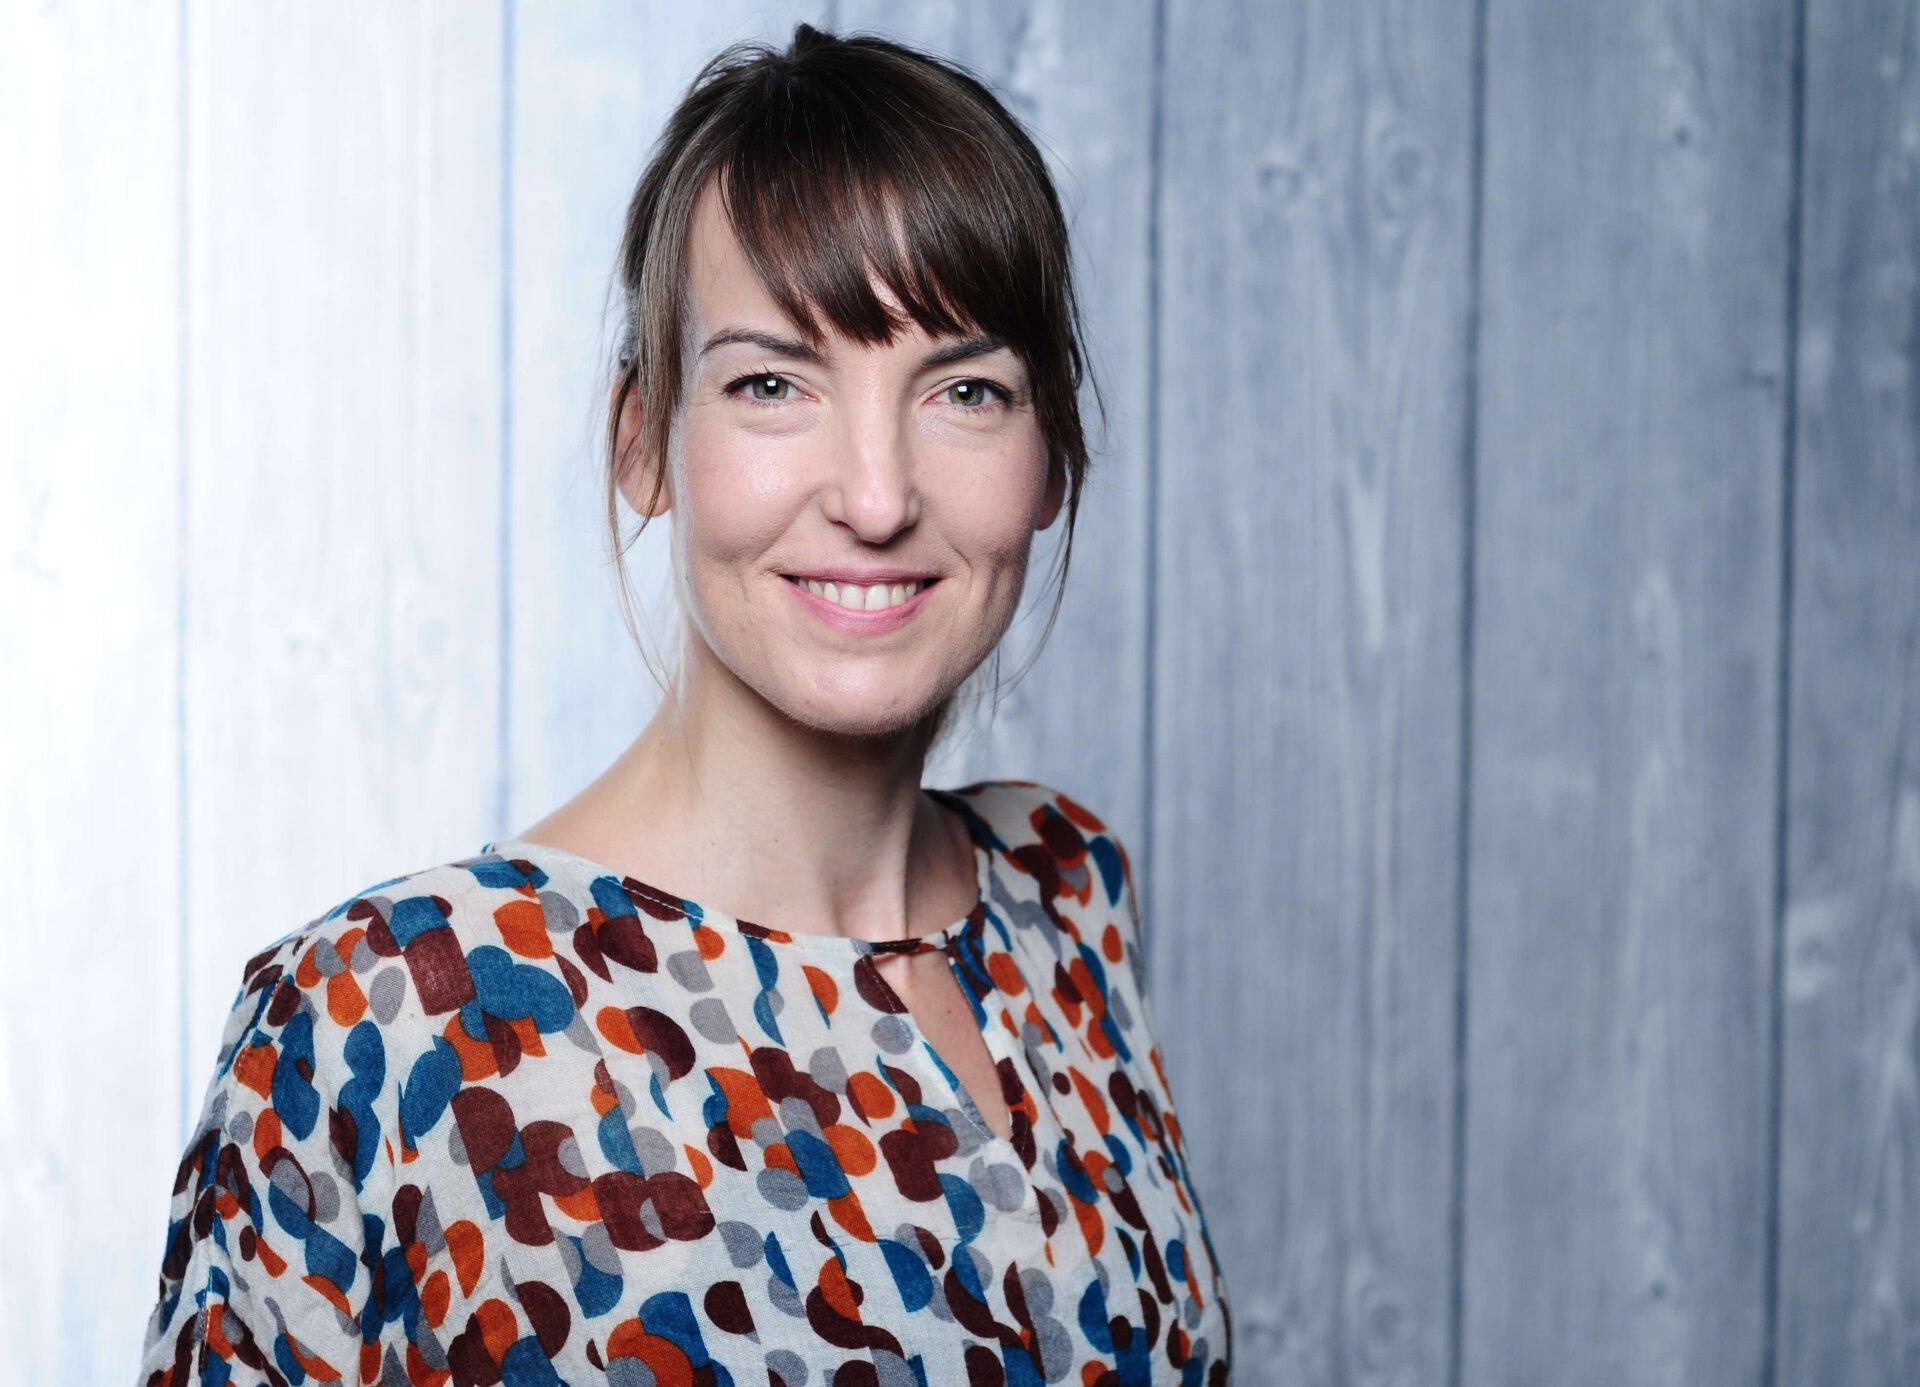 Dr. Sandra Gärtner GF GreenAdz und mediaresearch42